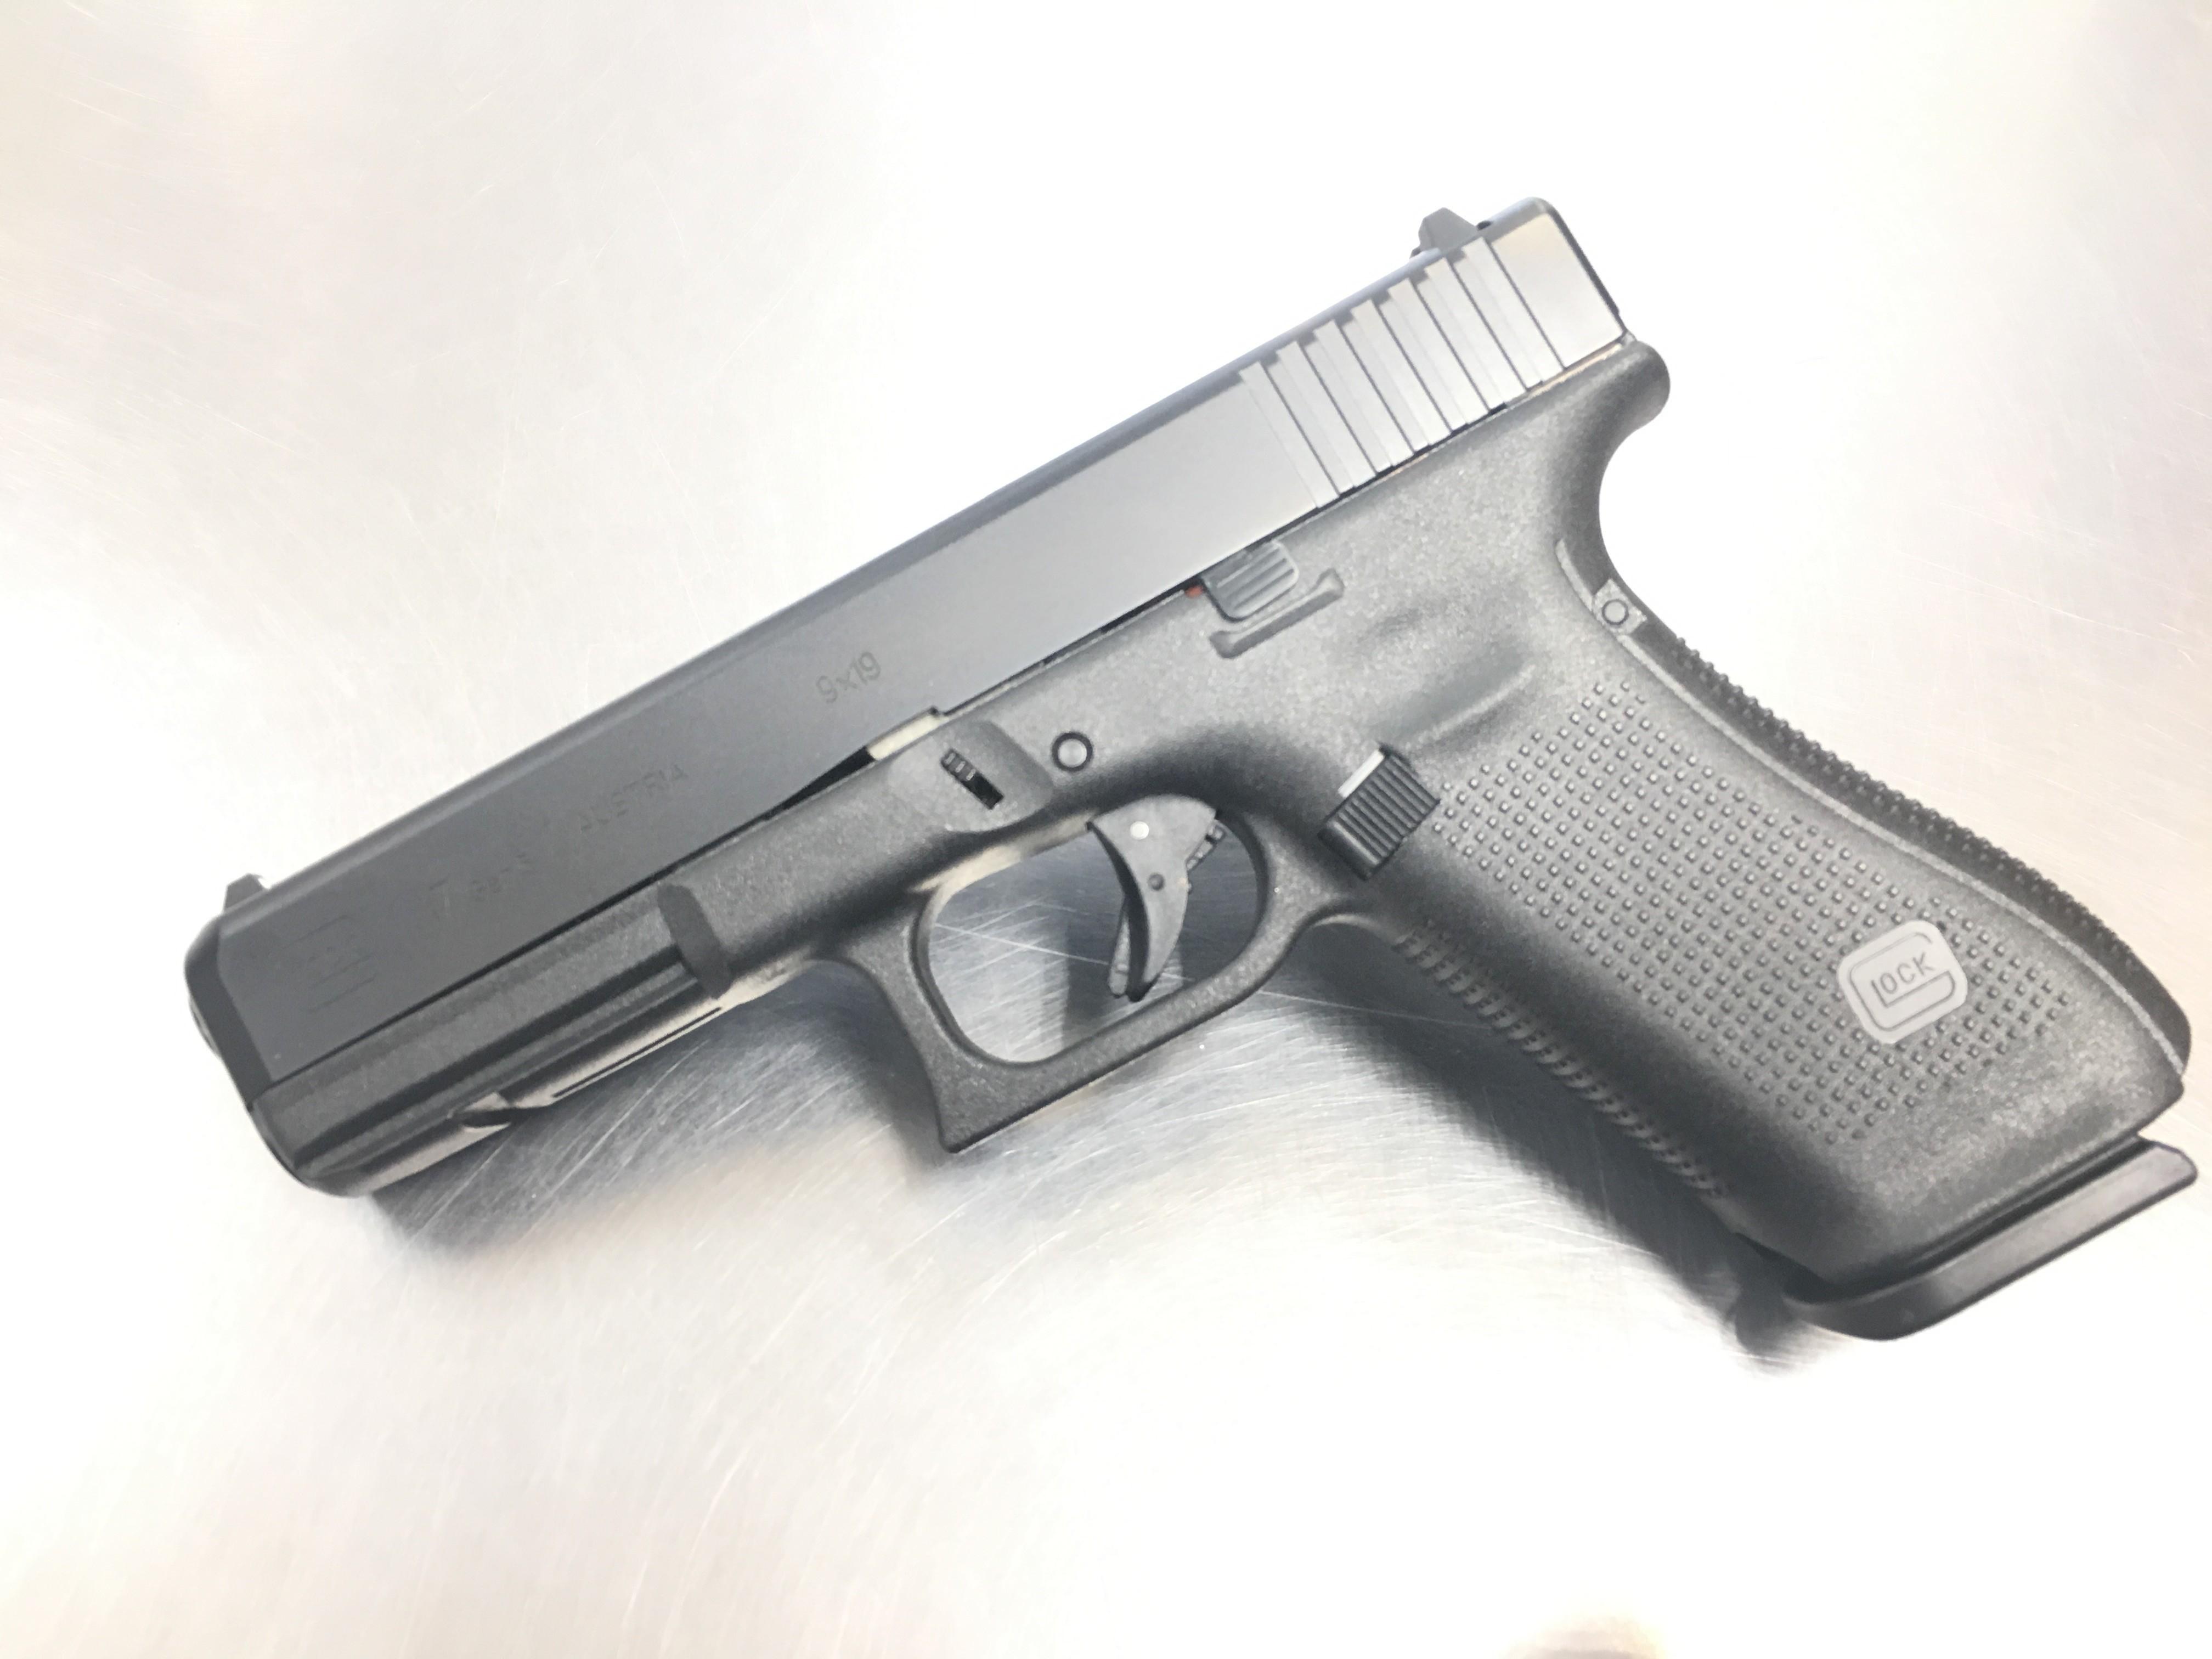 GLOCK 17 Gen 5 9mm Pistol With Marksman Barrel 3-17 Mags PA1750203